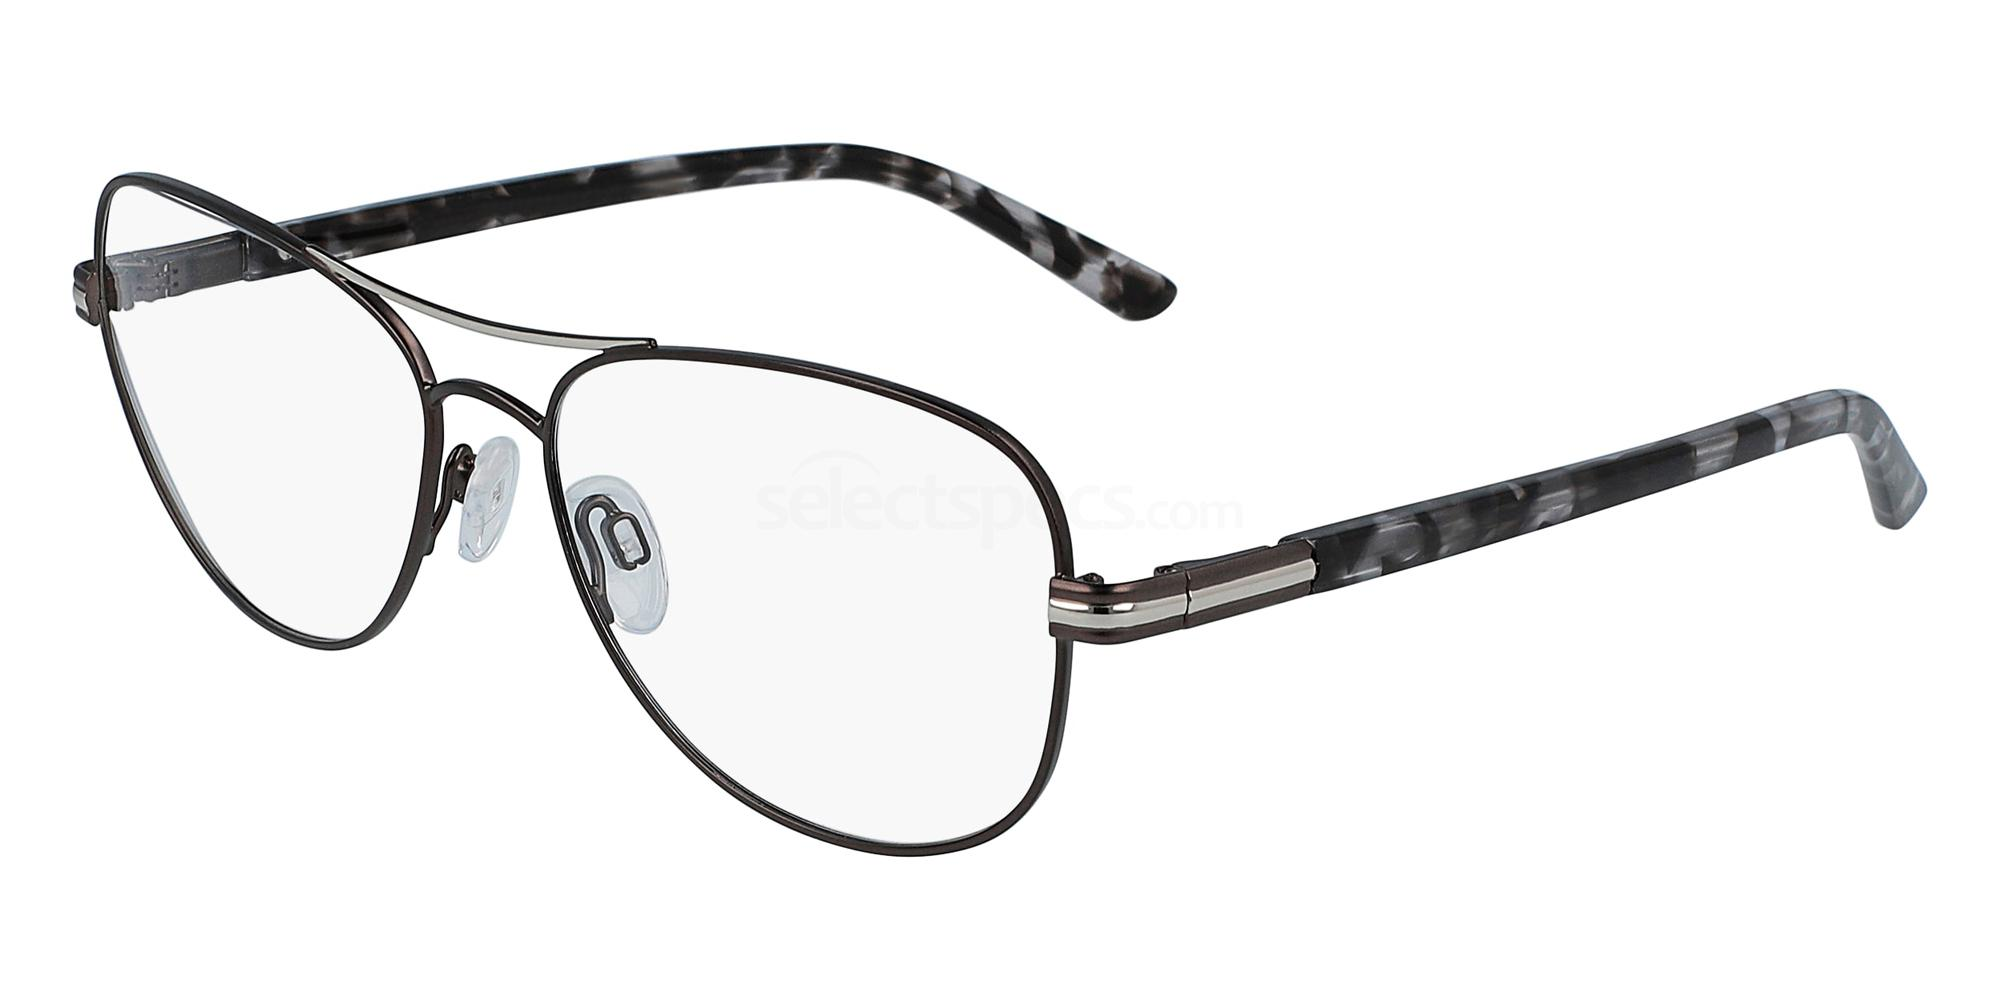 001 SK2829 KLASSISK Glasses, Skaga